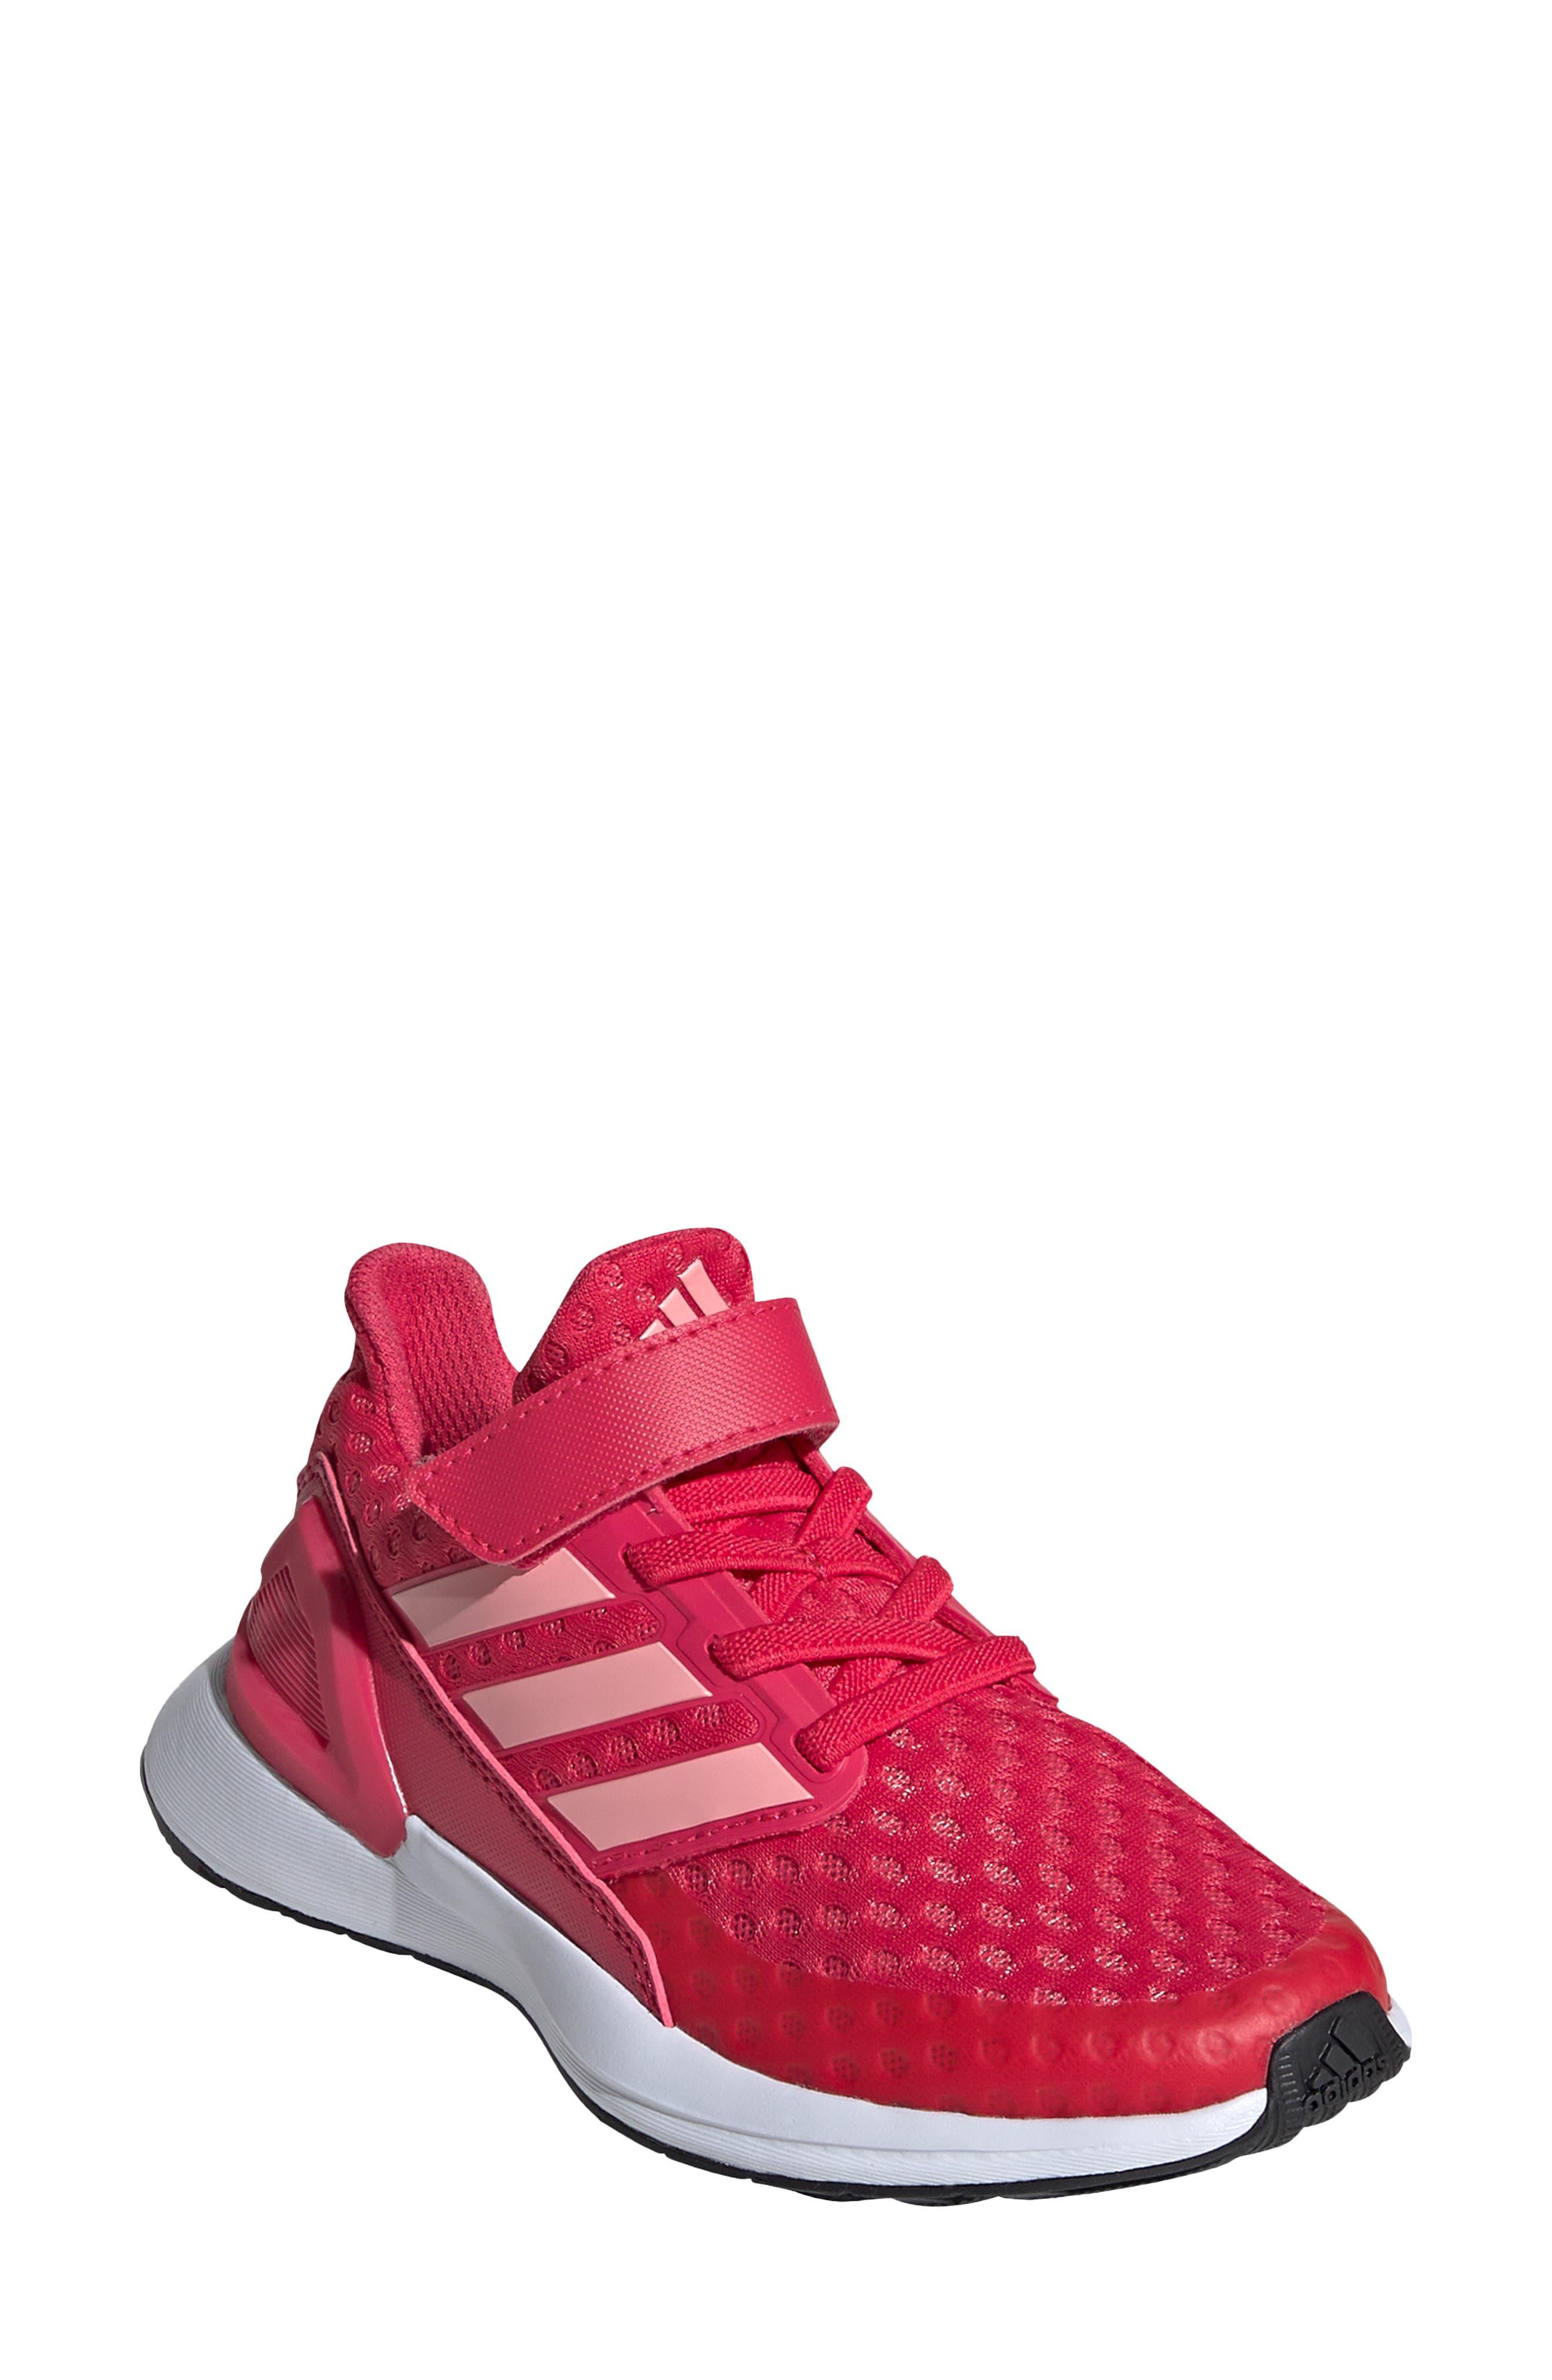 Image of adidas RapidaRun Running Sneaker